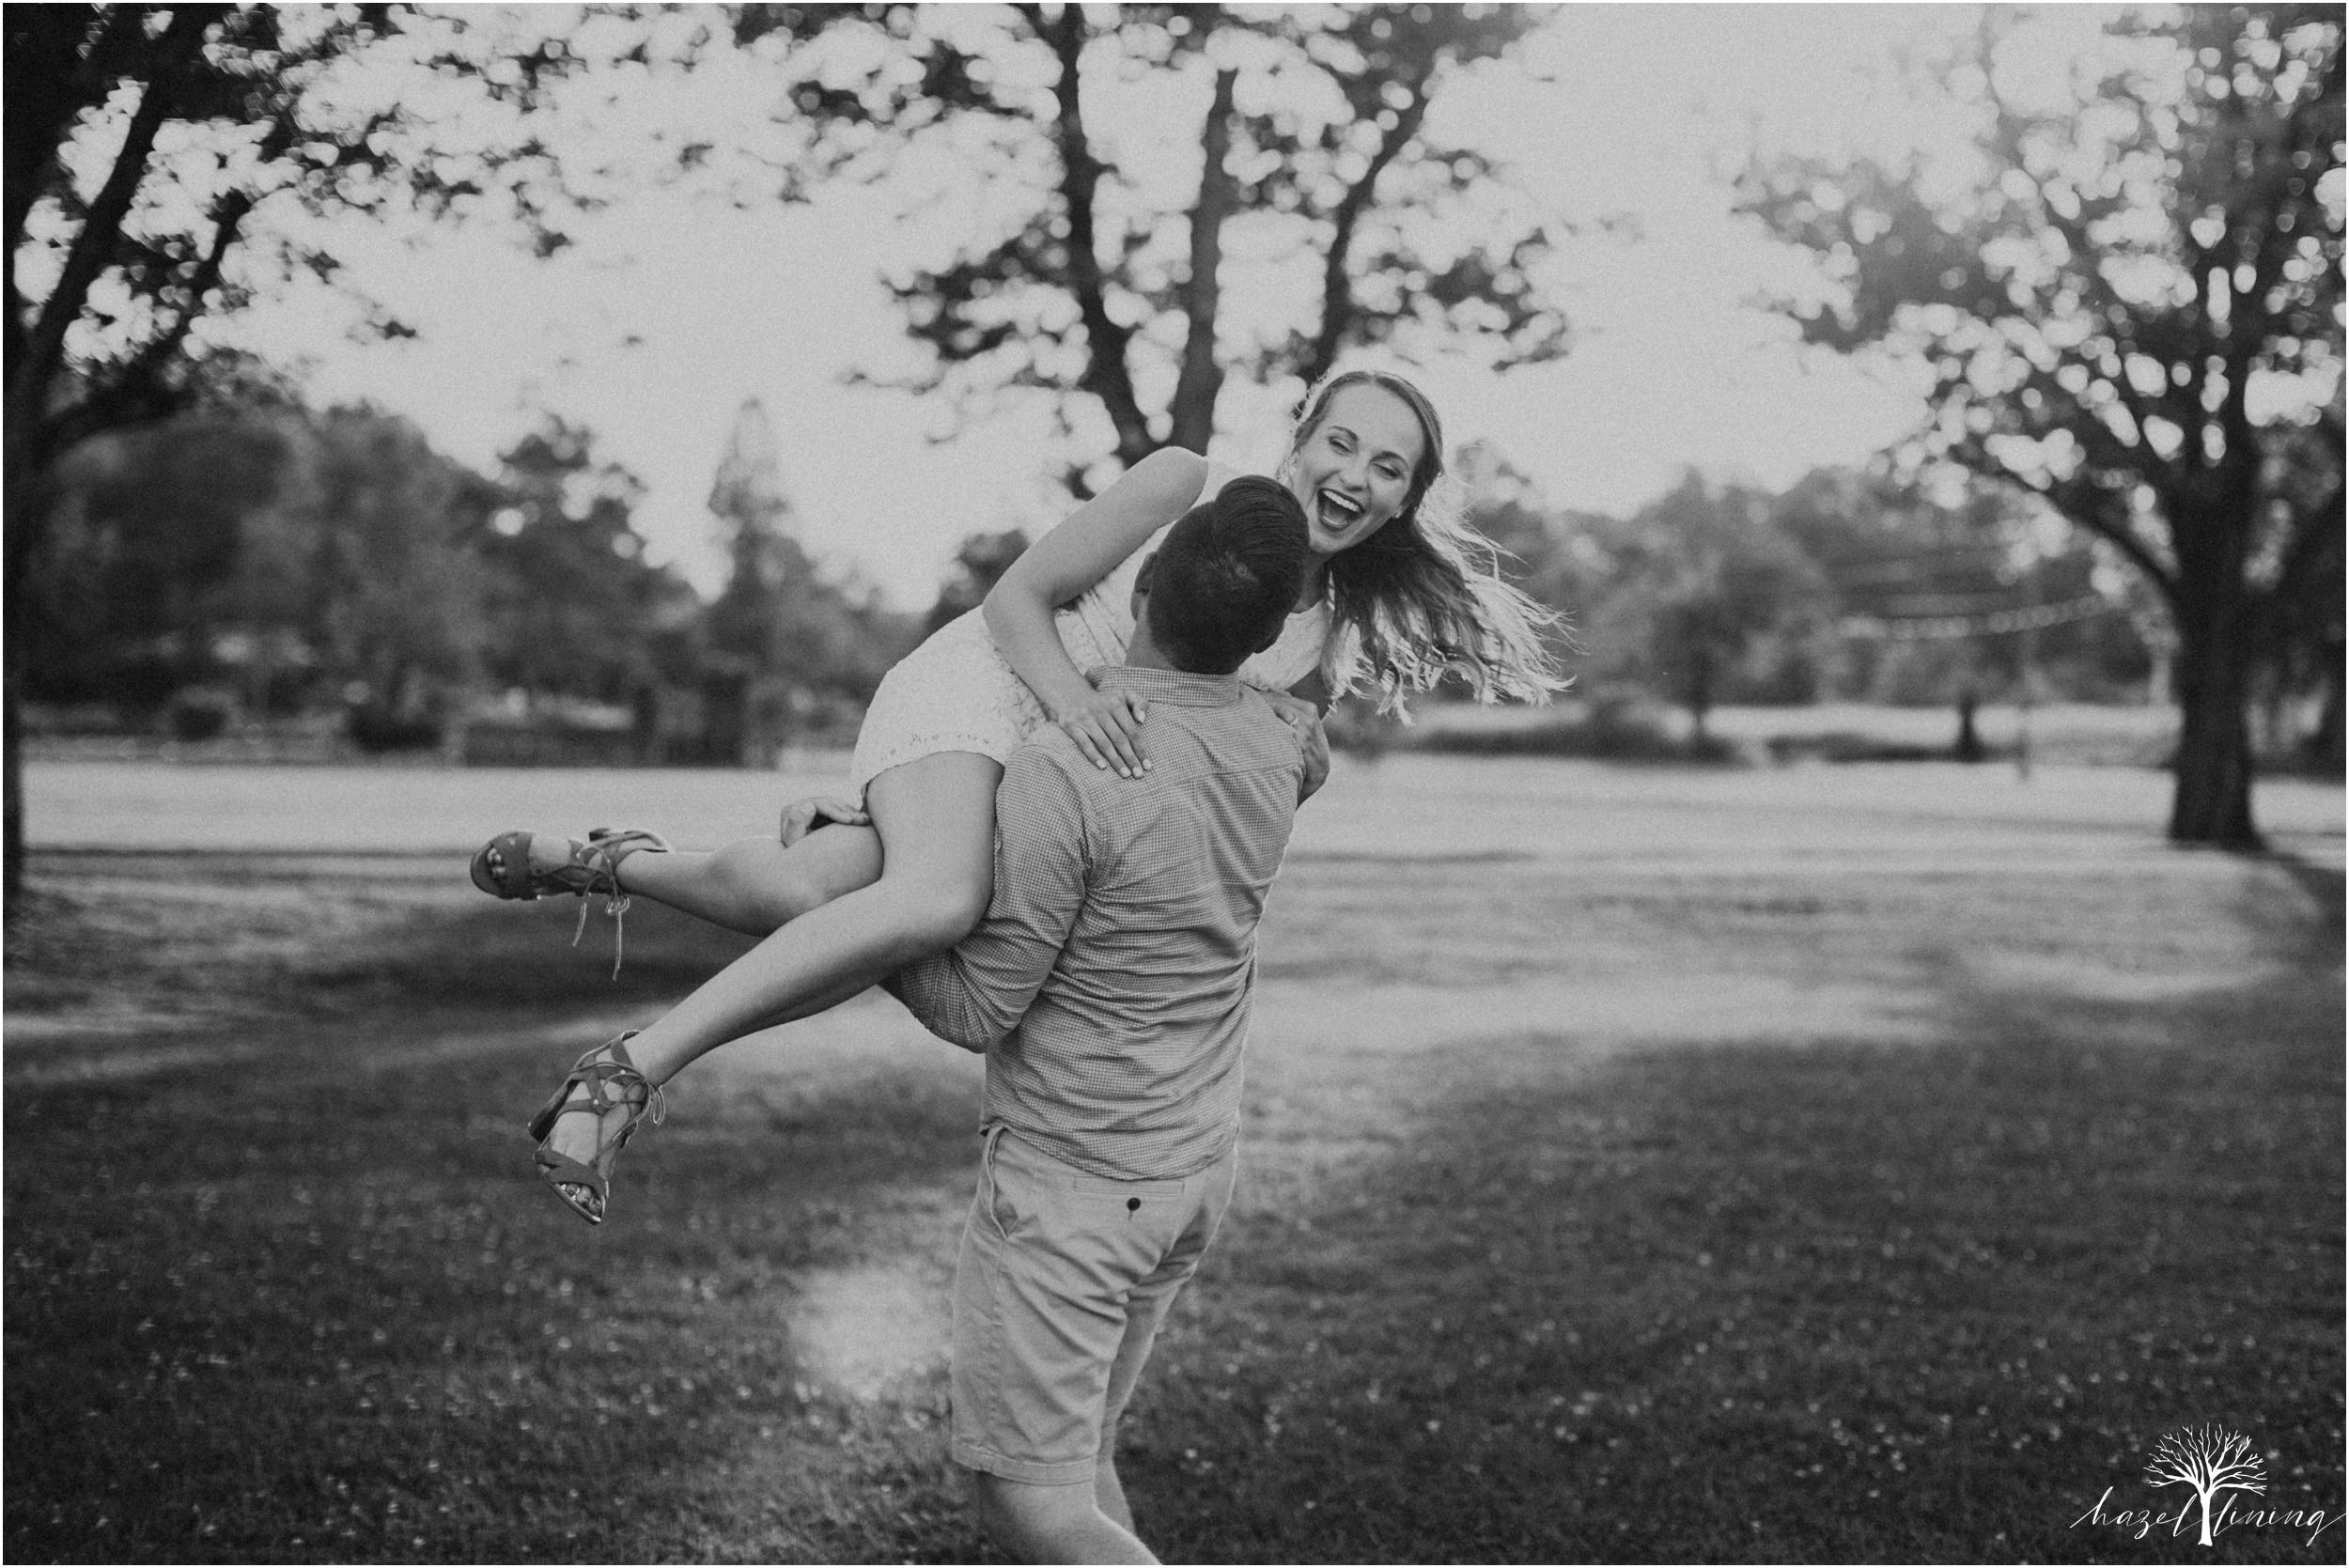 rachel-warner-chris-niedrist-the-farm-bakery-and-events-quakertown-pa-summer-engagement-hazel-lining-photography-destination-elopement-wedding-engagement-photography_0016.jpg